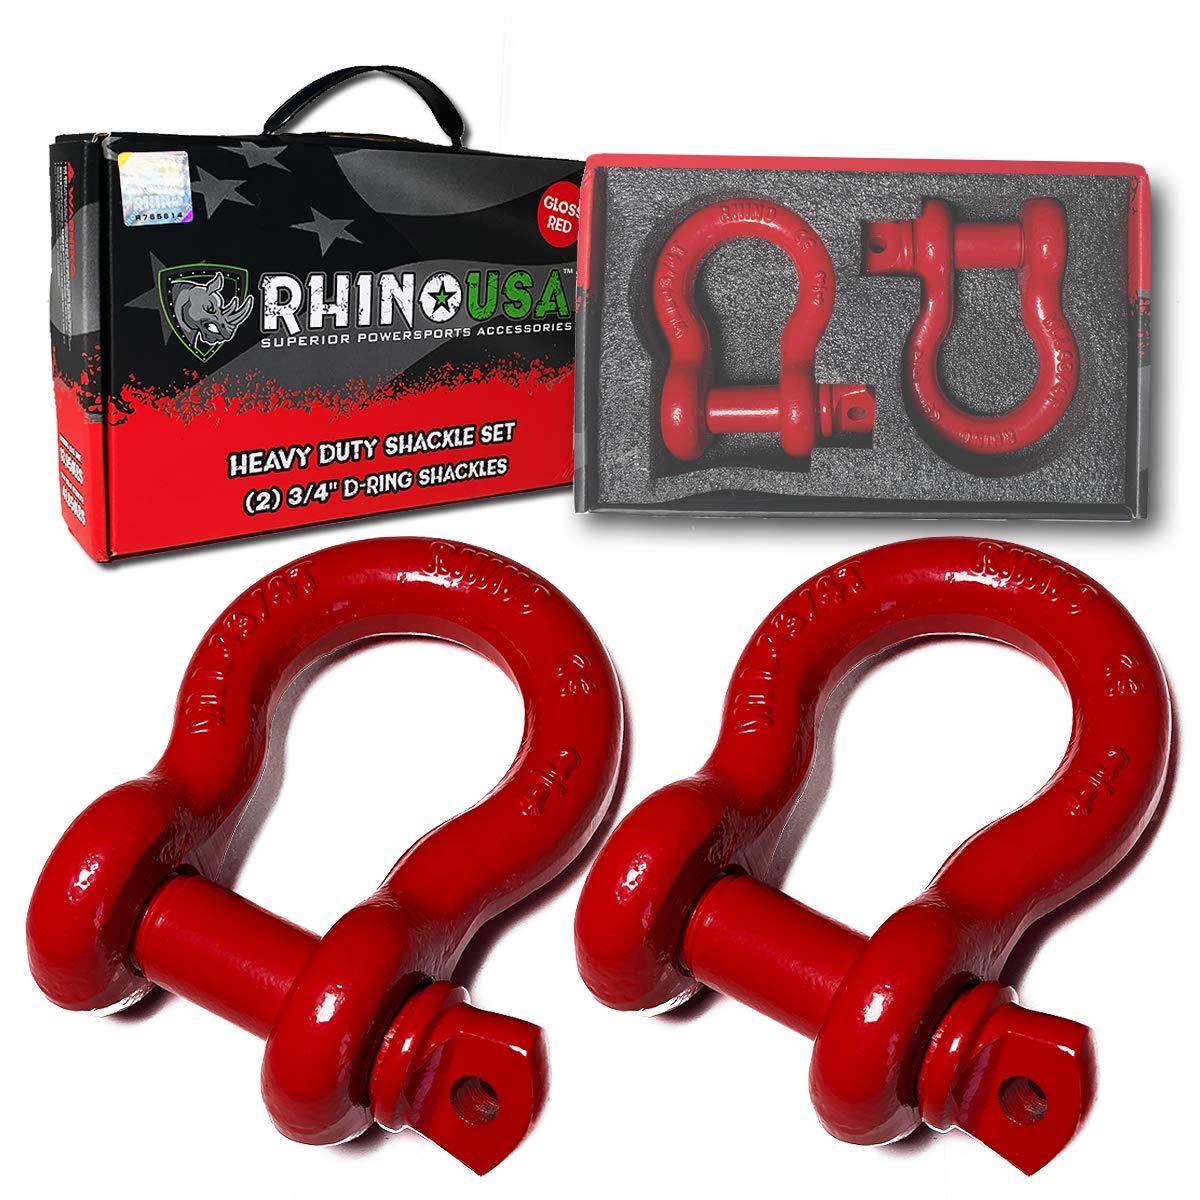 Rhino USA Shackle 850lb Strength